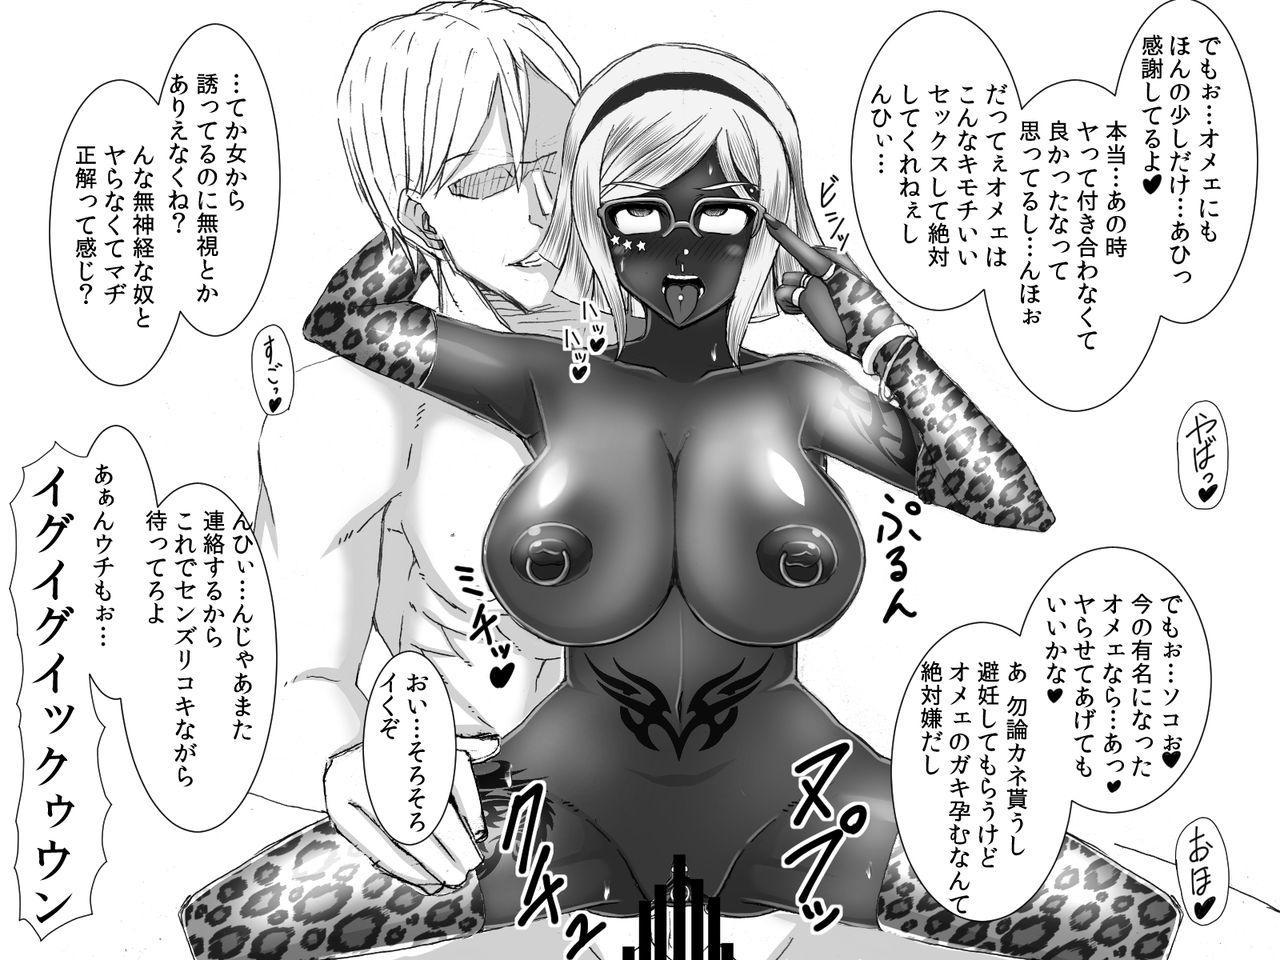 Kusurizuke! Sennou! Kikai Kaizou! Kuroochi Bitch-ka Heroine +α 202